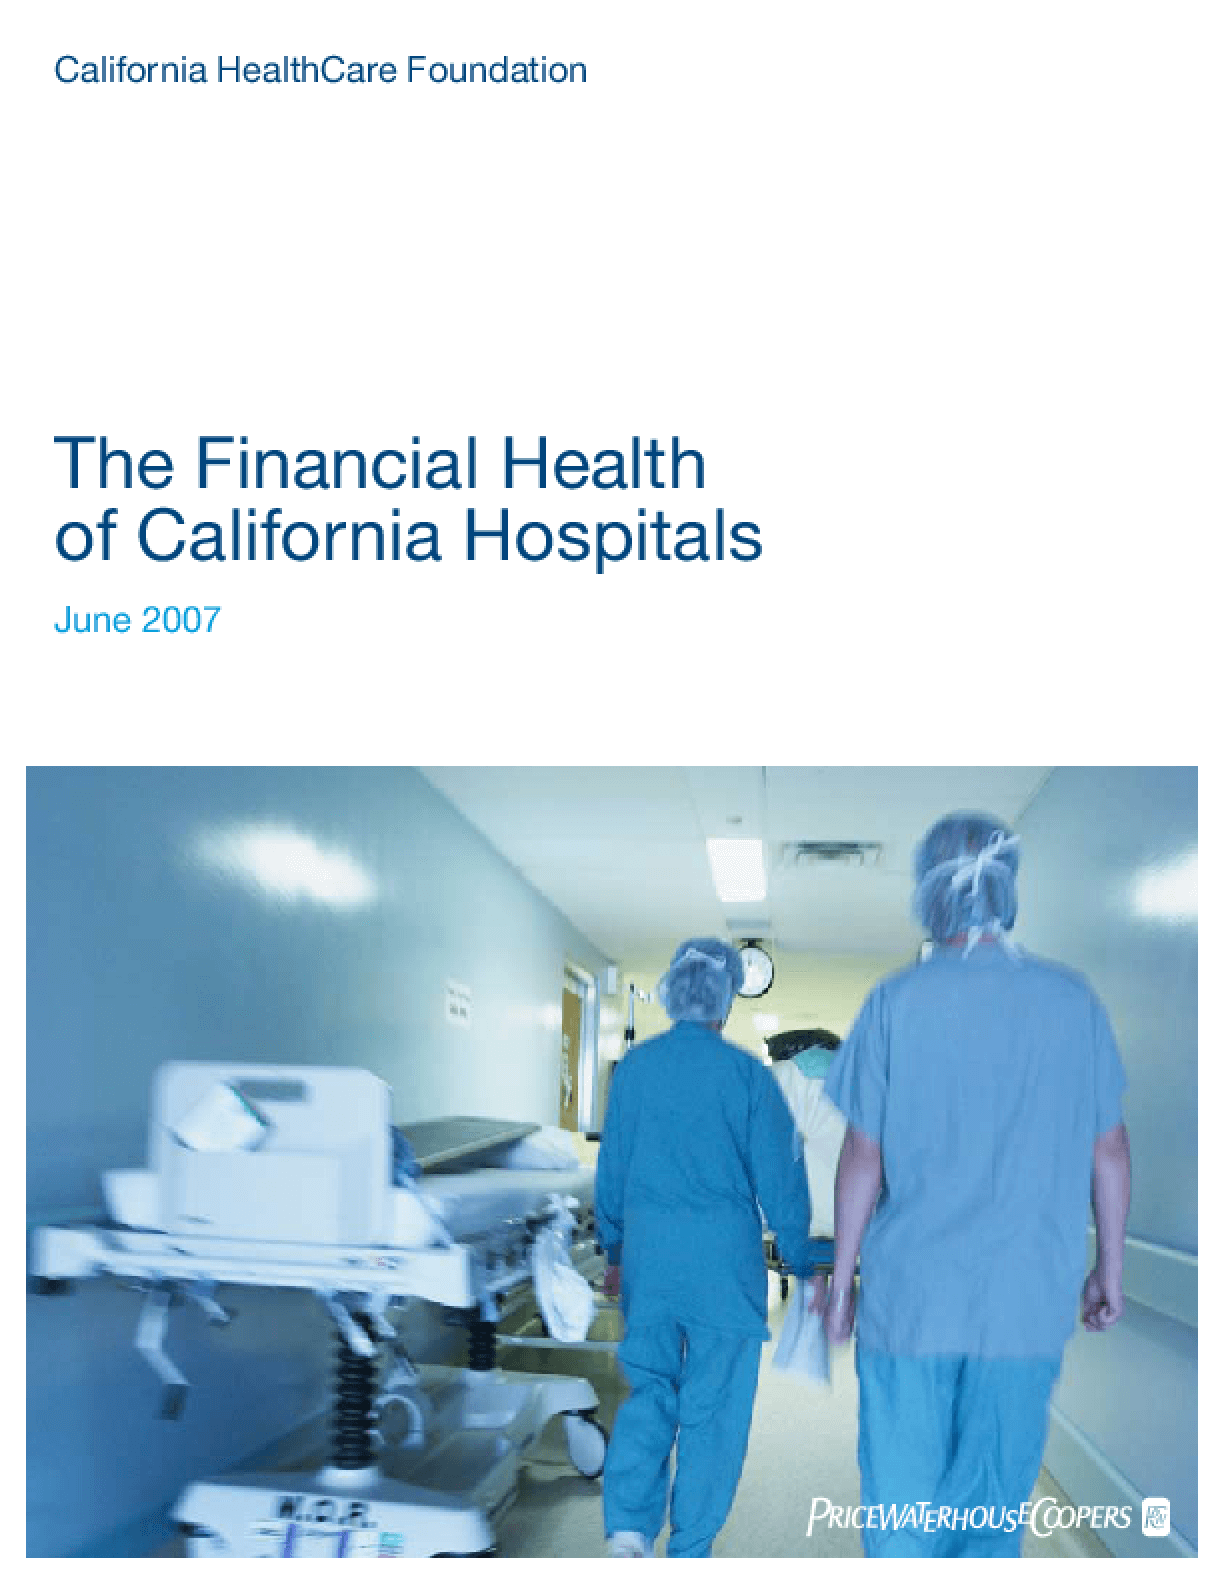 Financial Health of California Hospitals